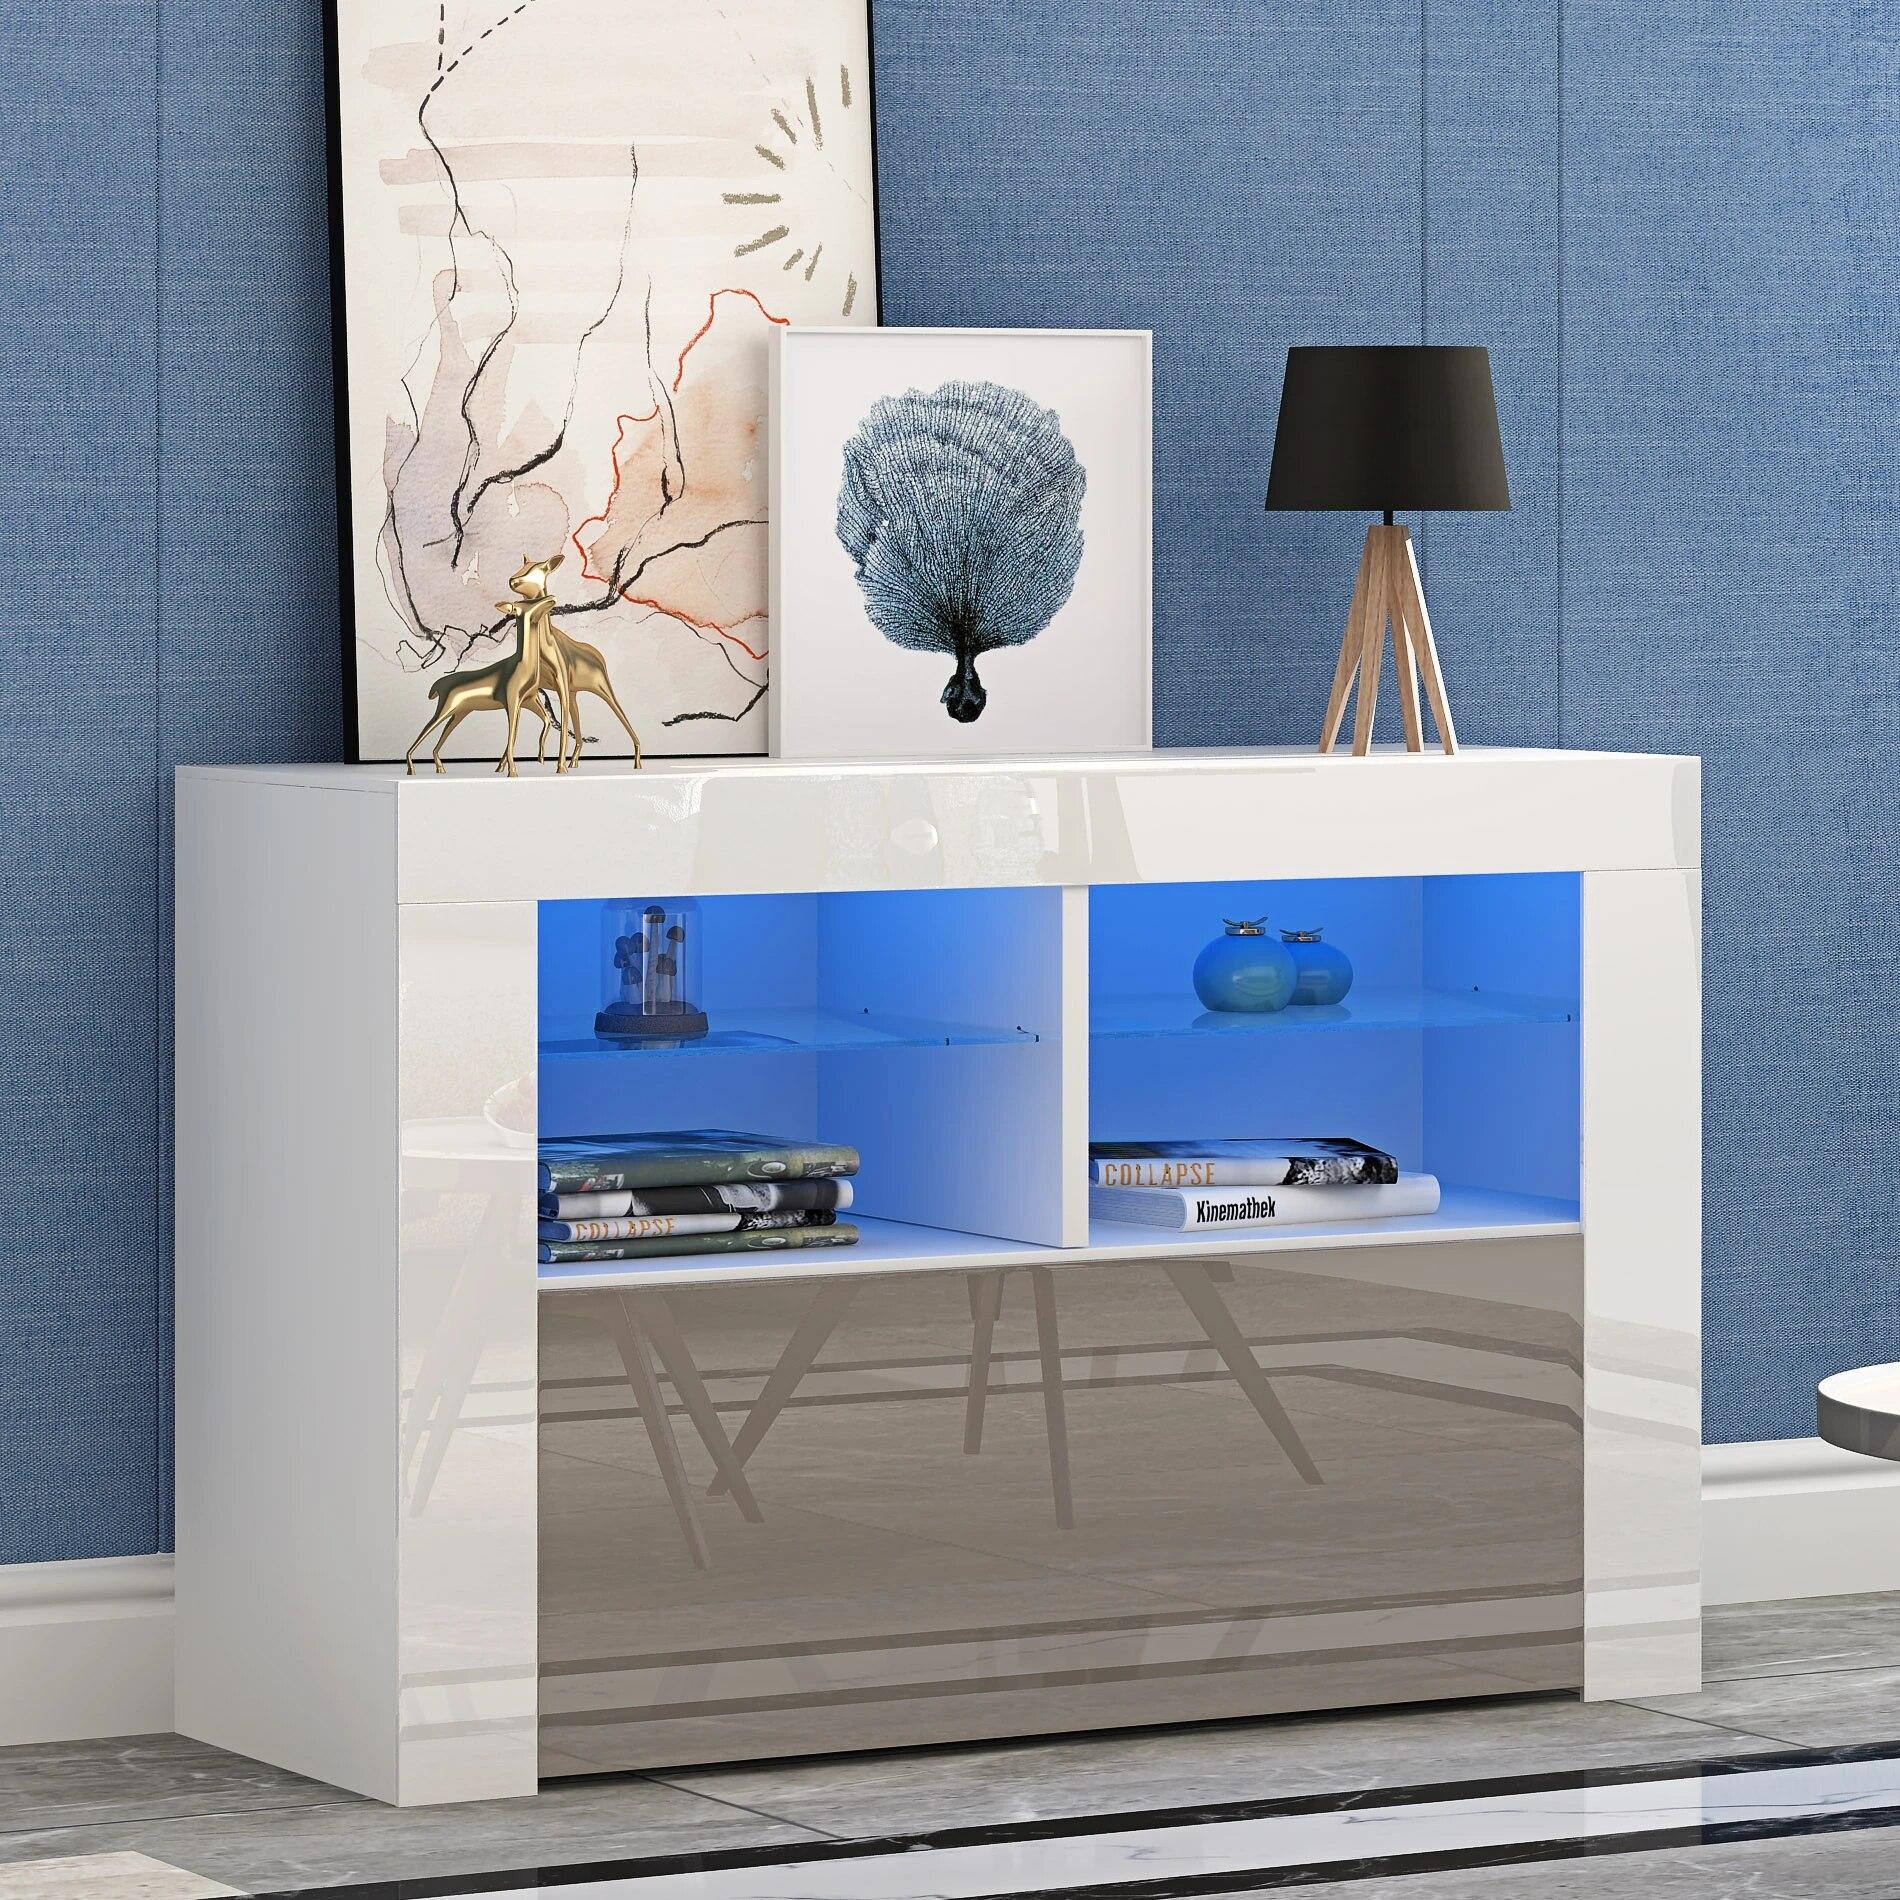 panana moderne salon meubles tv armoires haute brillance porte meuble tv buffet mat chambre organisateur affichage